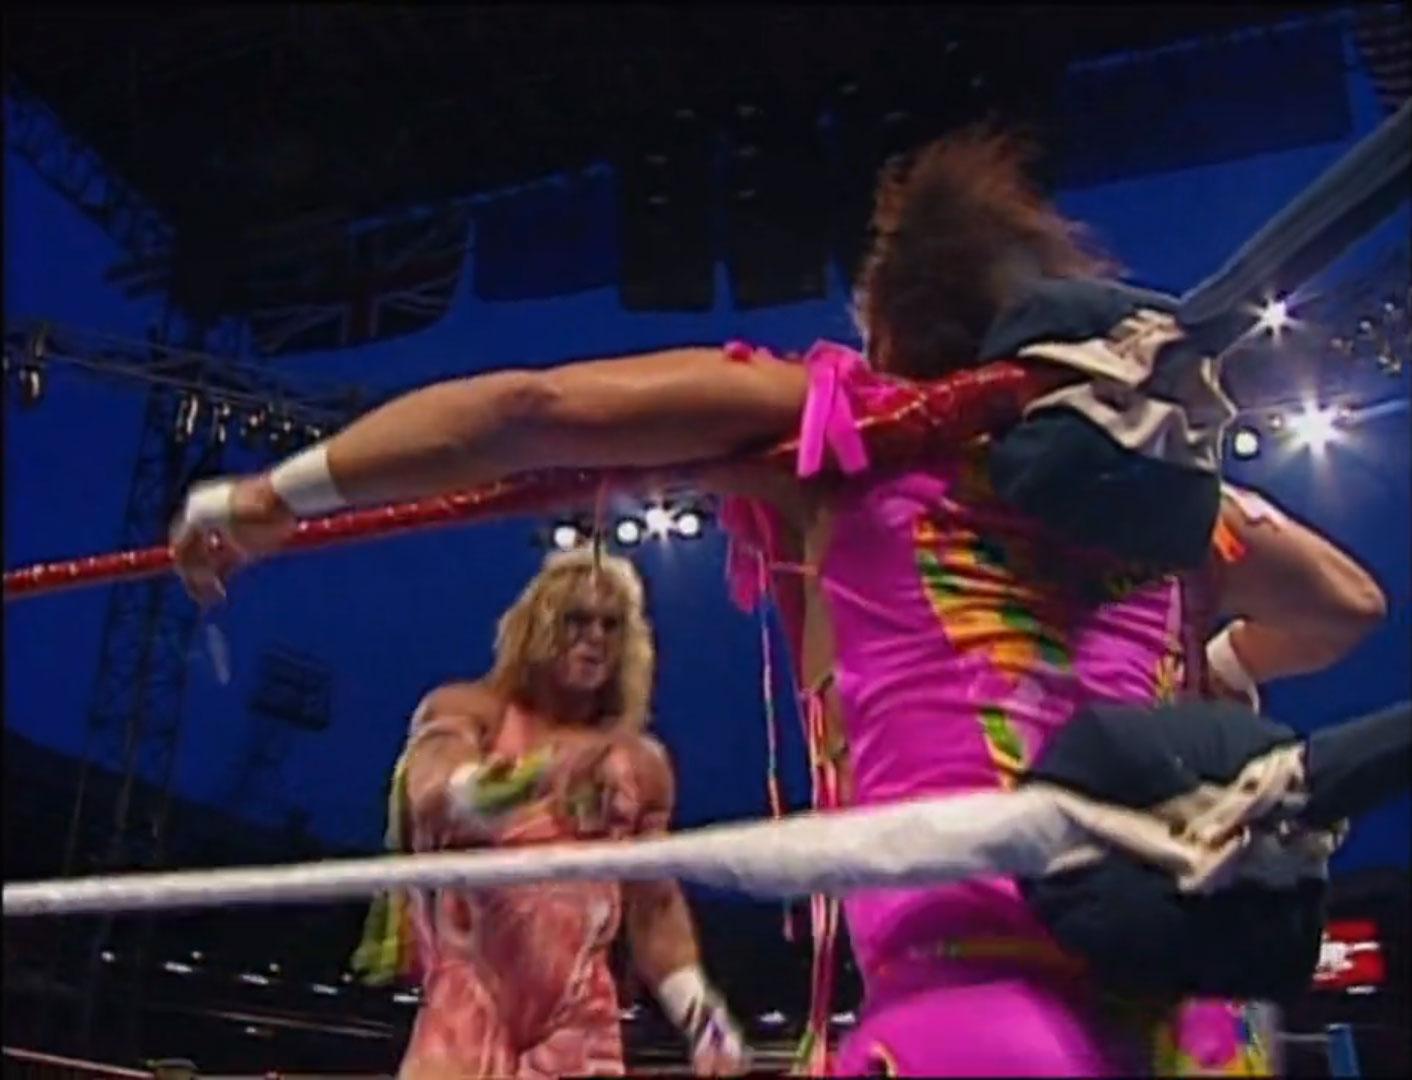 The Ultimate Warrior vs. Randy Savage WWF World Heavyweight Championship WWF SummerSlam '92, Aug 29th 1992